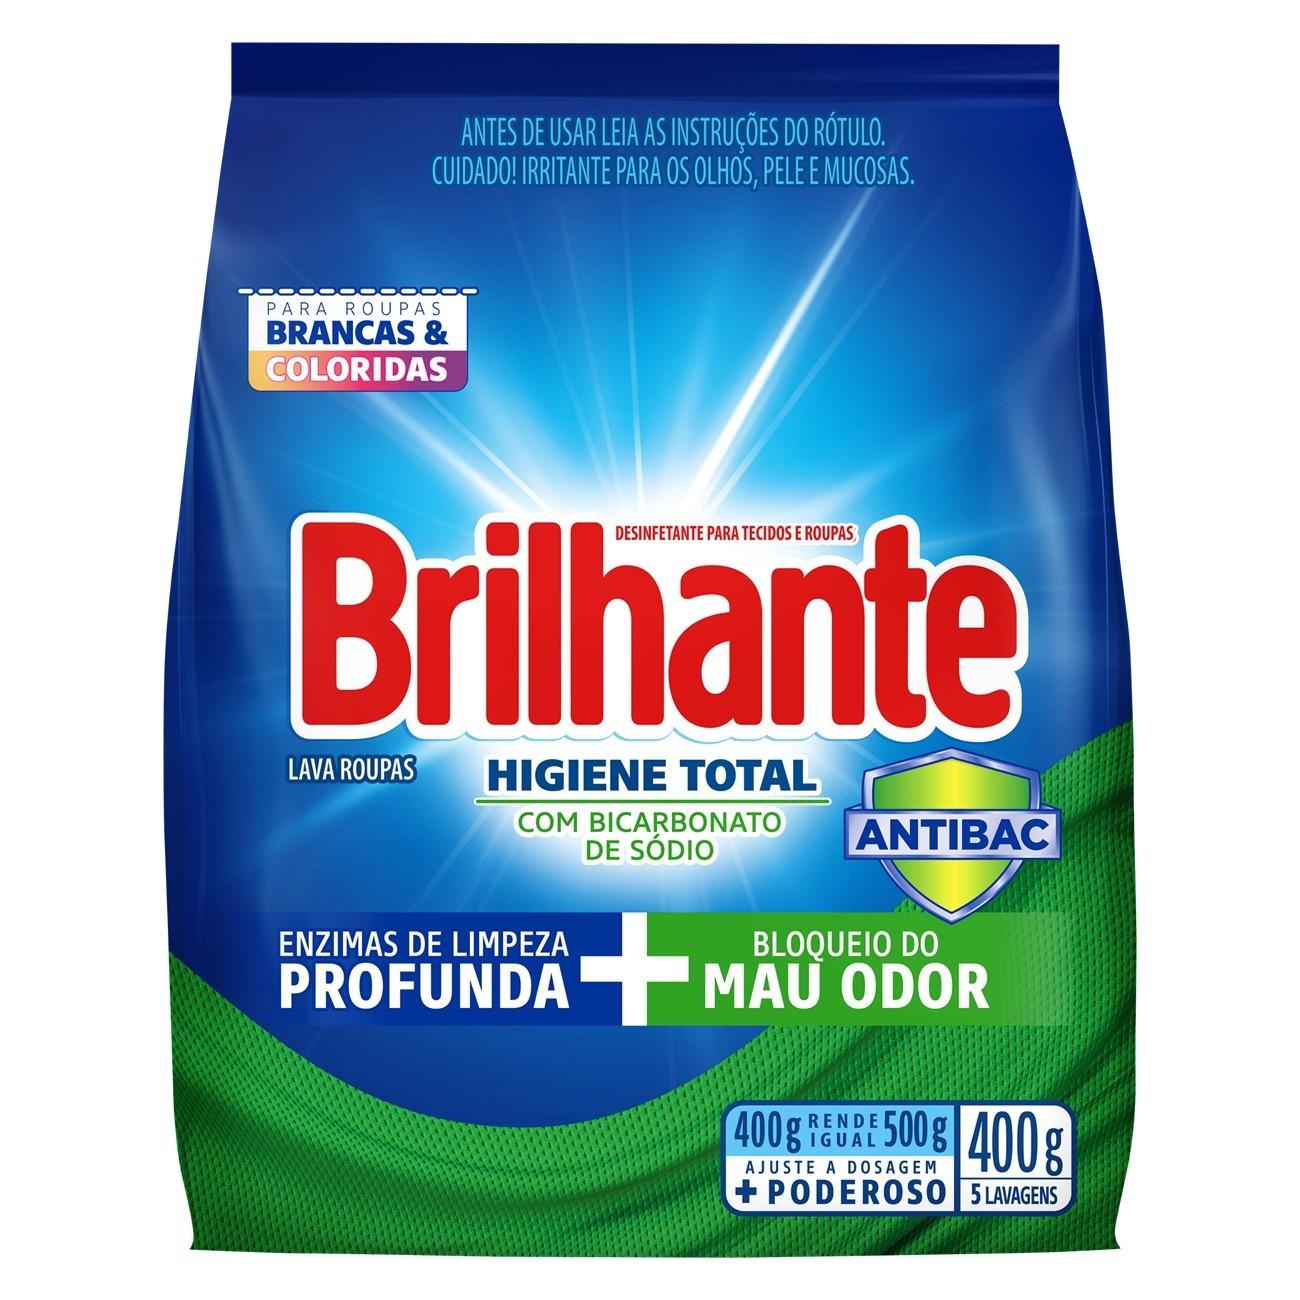 BRILHANTE PO HIG TOT ANTIBAC BAG 400G(27